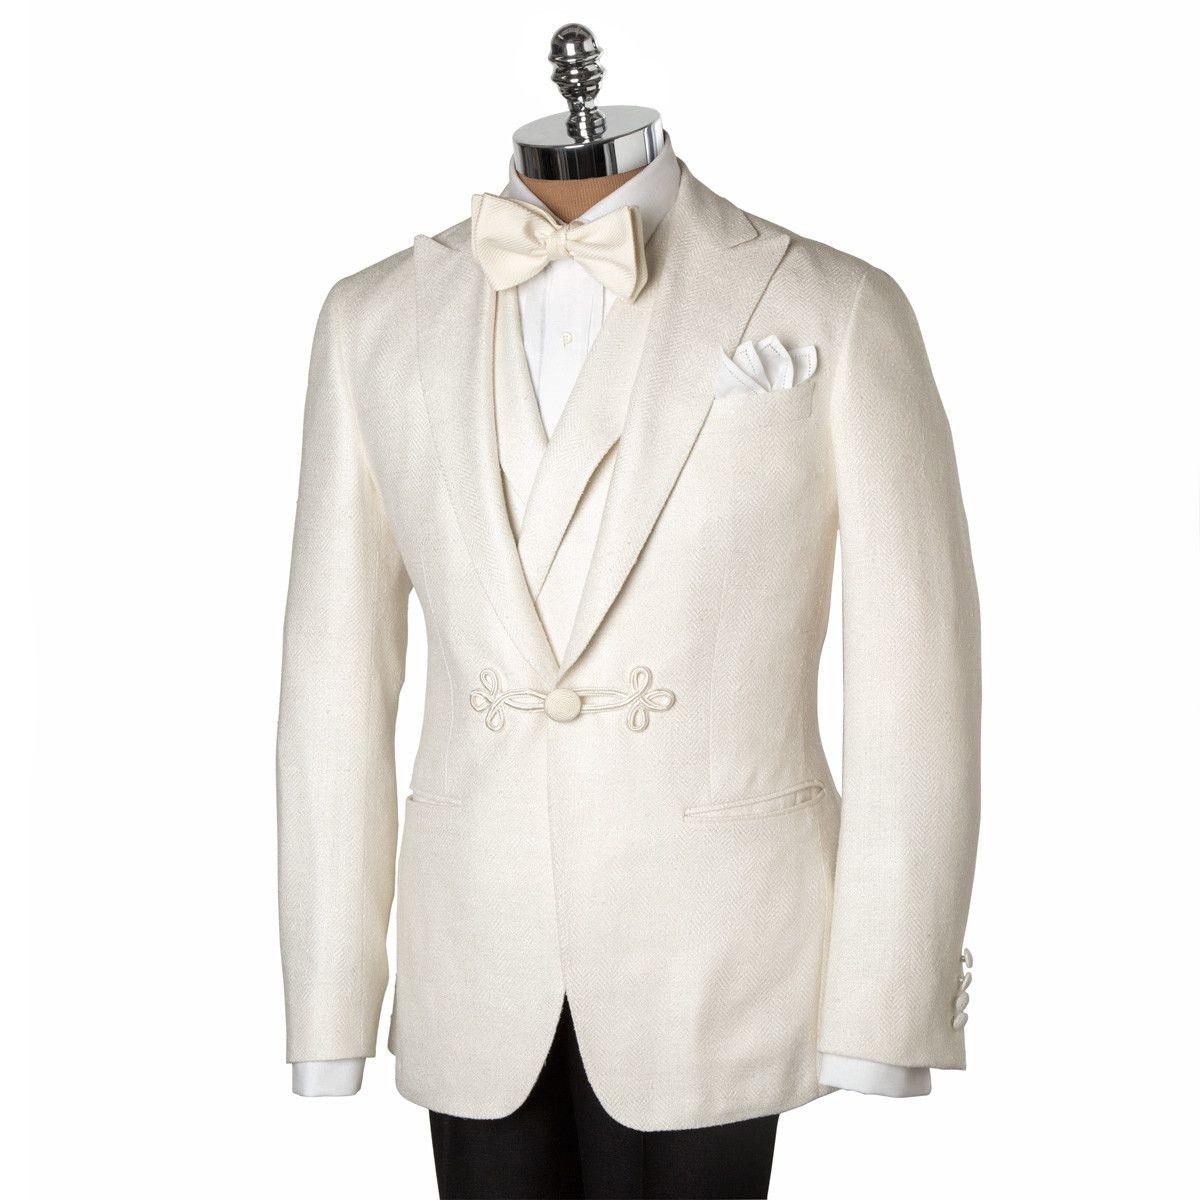 4ae94eb7573 PaulStuart CREAM SILK HERRINGBONE DINNER JACKET | Man-Ware/Wear in ...